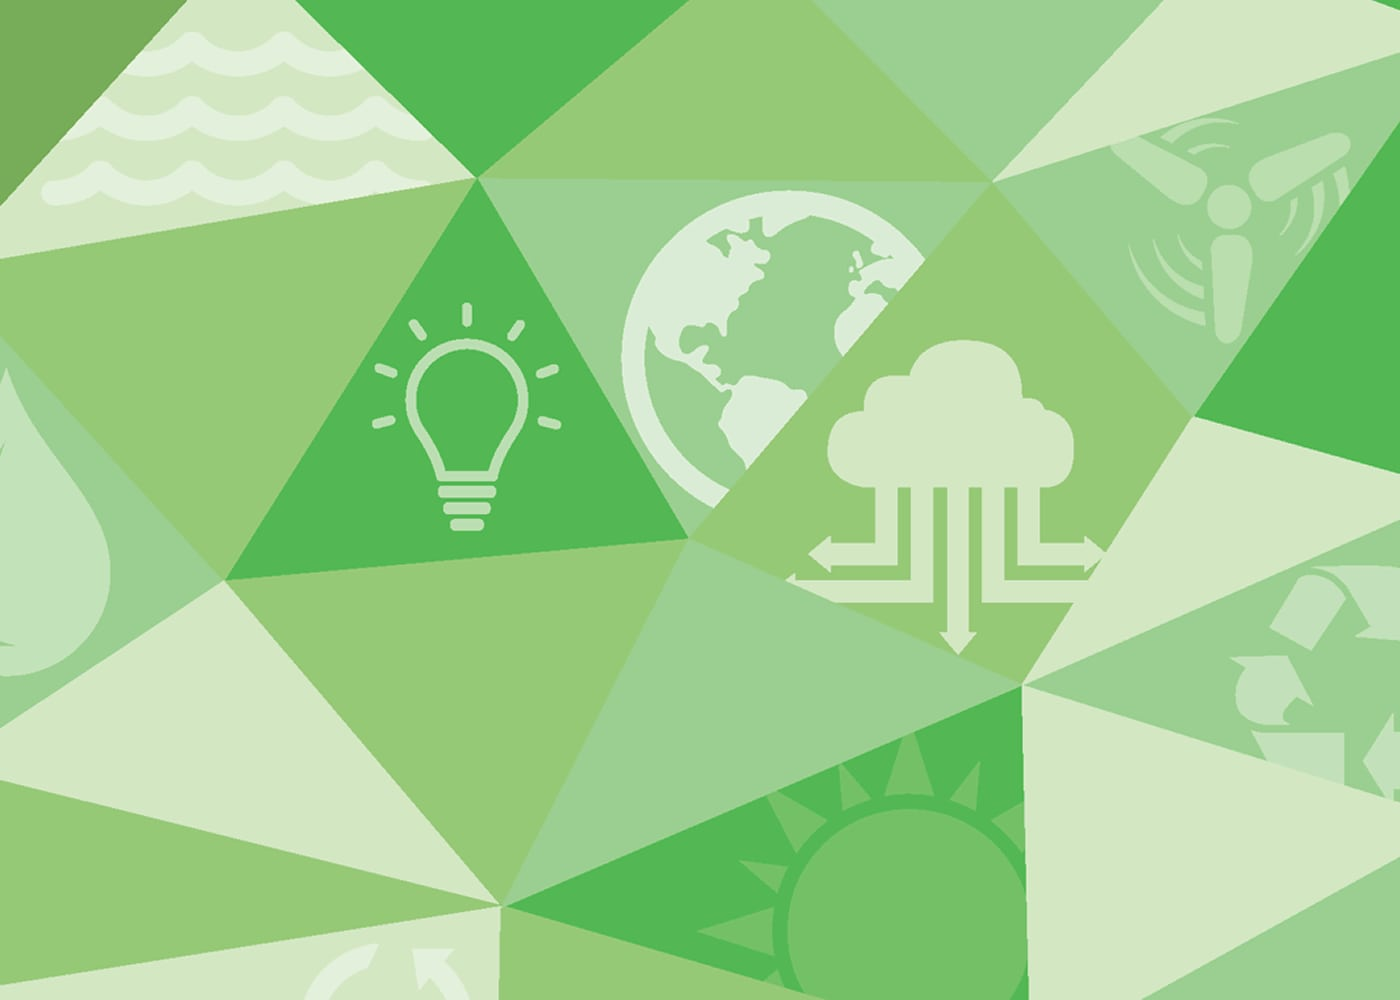 naem-webinar-2017-sustainability-management-conference-livestream-700x500